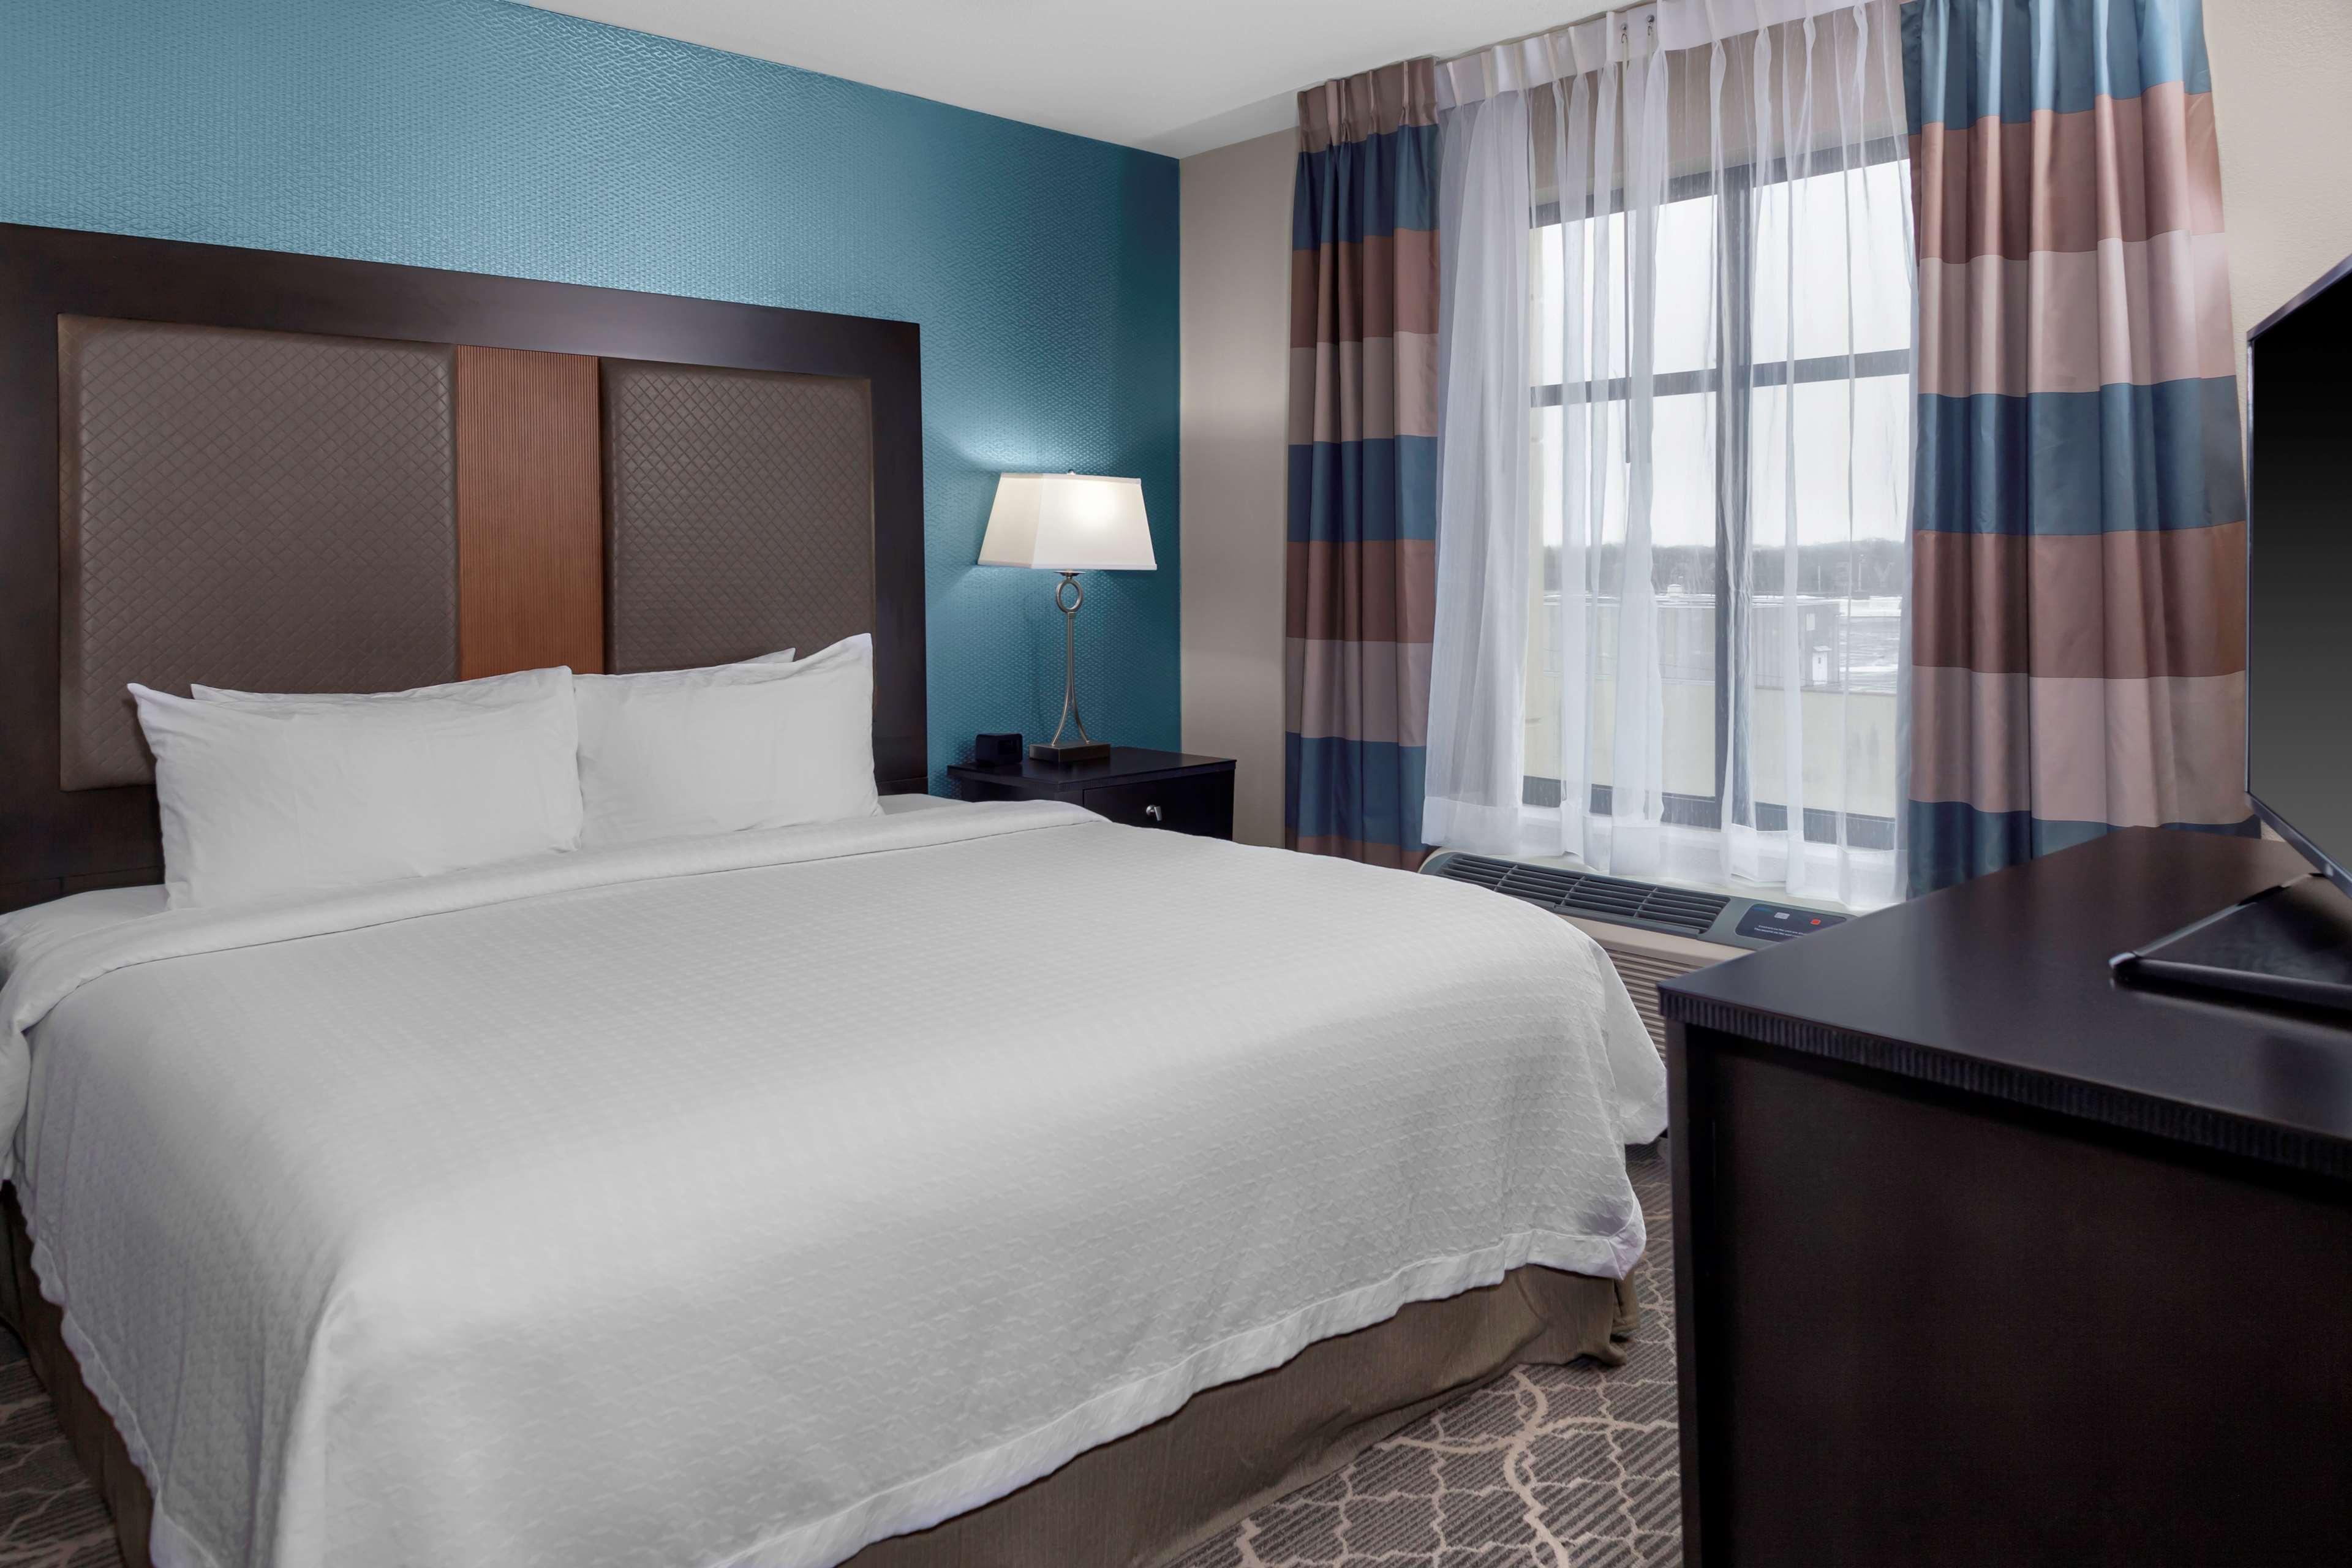 Homewood Suites by Hilton Wauwatosa Milwaukee image 10